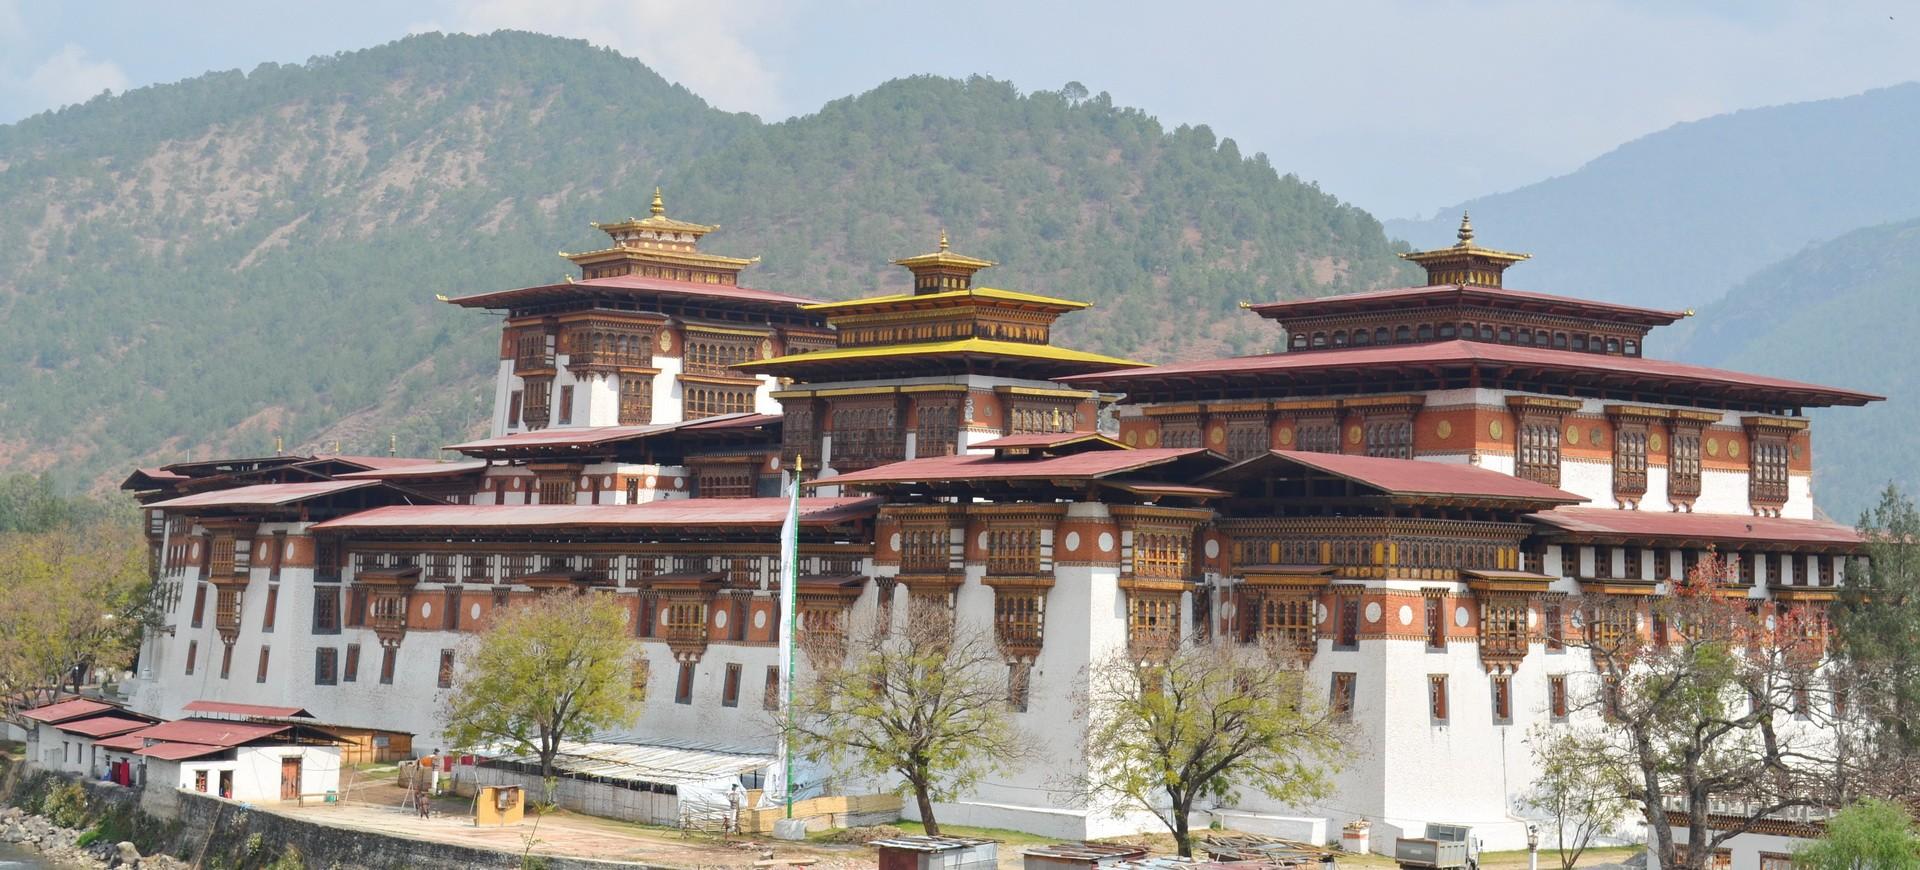 Bhutan Punakha Dzong Monastère